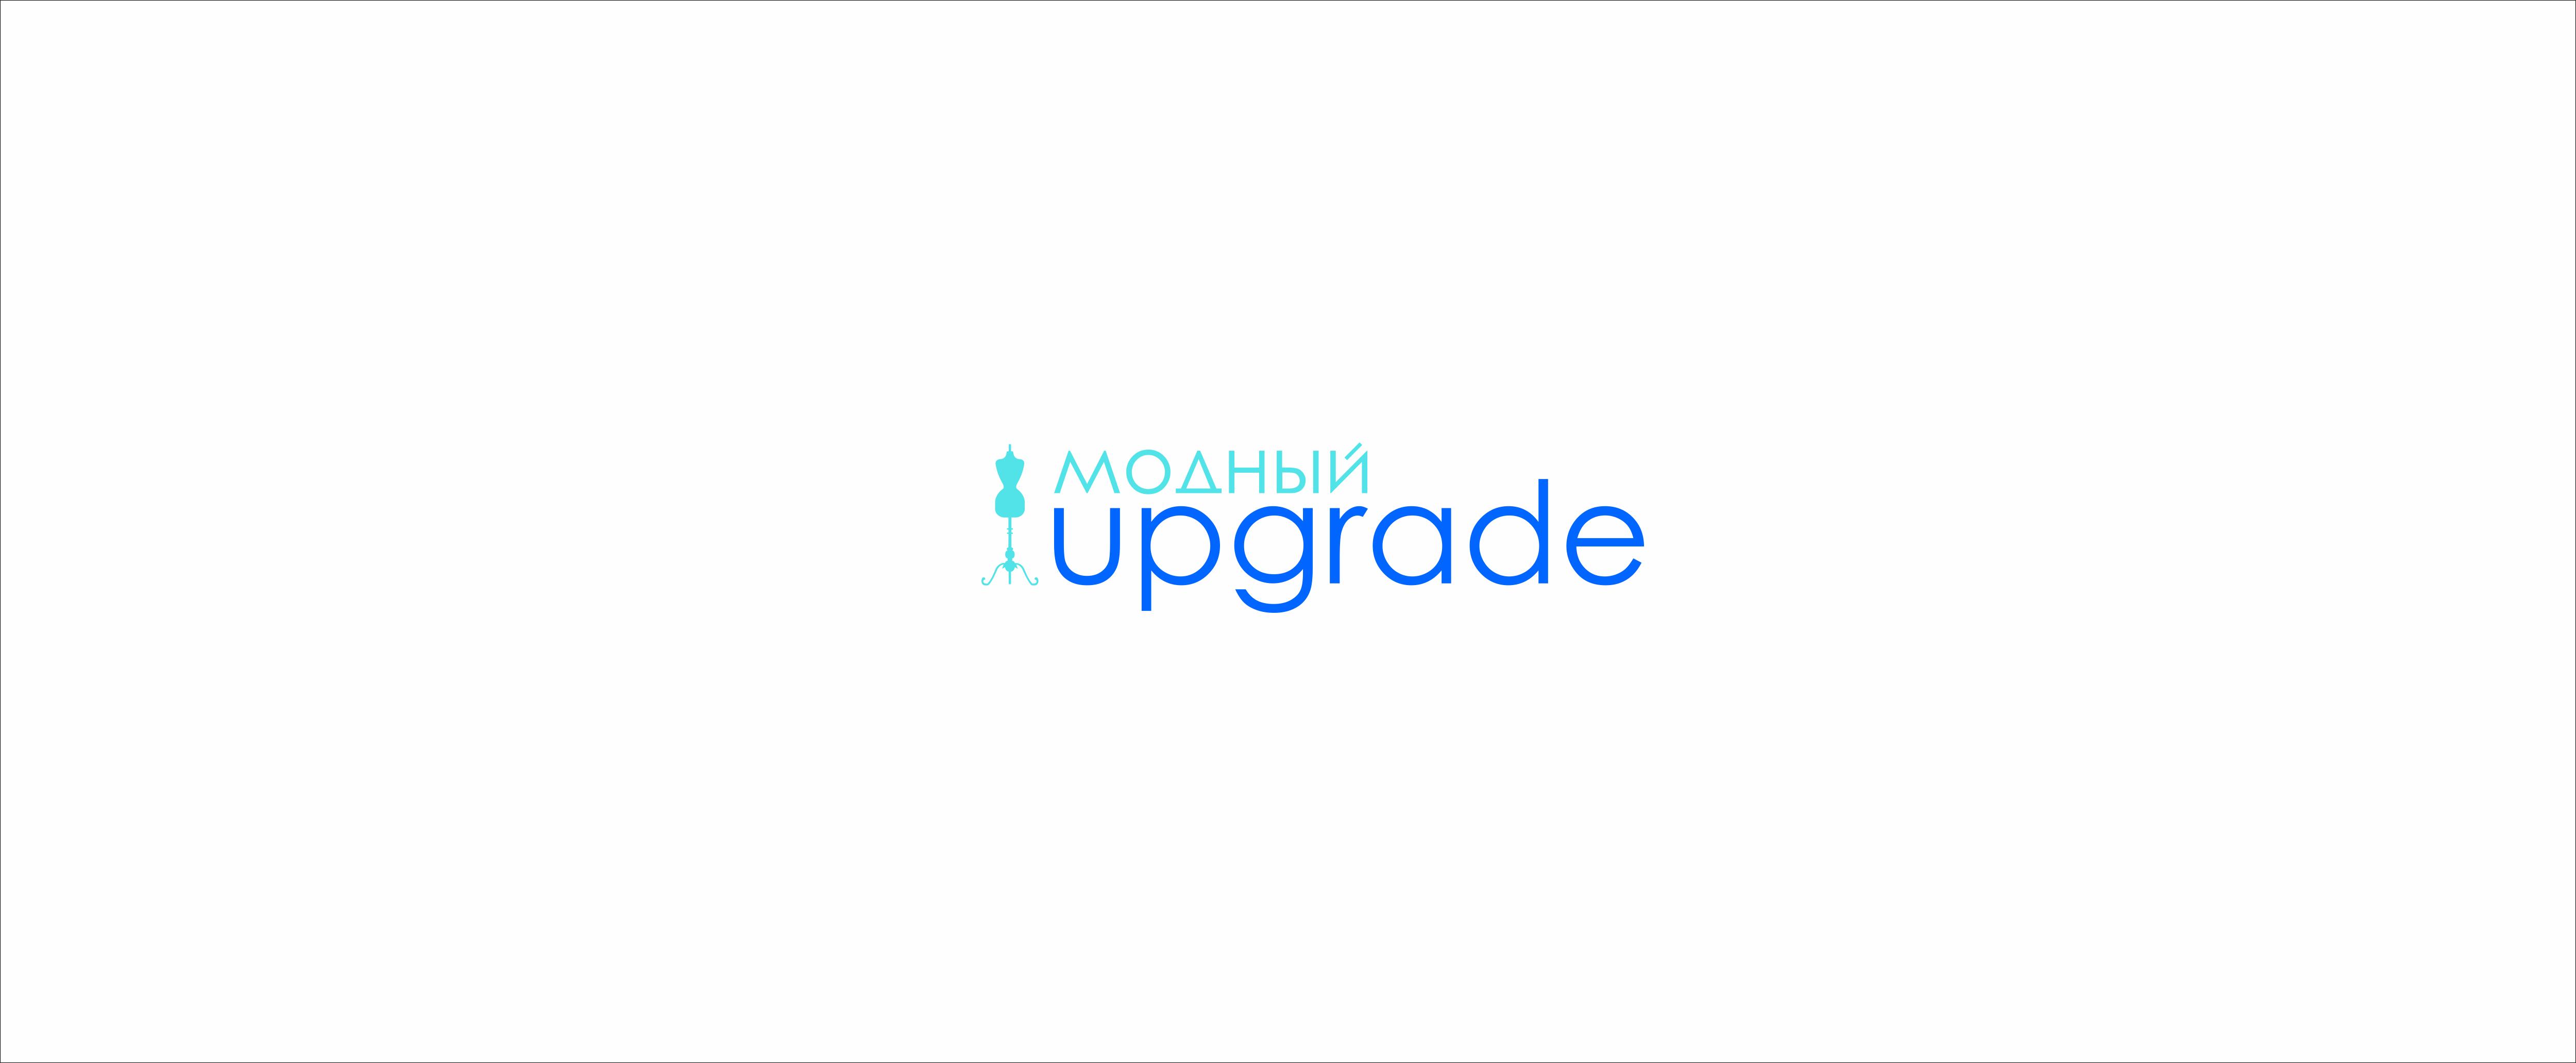 "Логотип интернет магазина ""Модный UPGRADE"" фото f_681594262843160c.jpg"